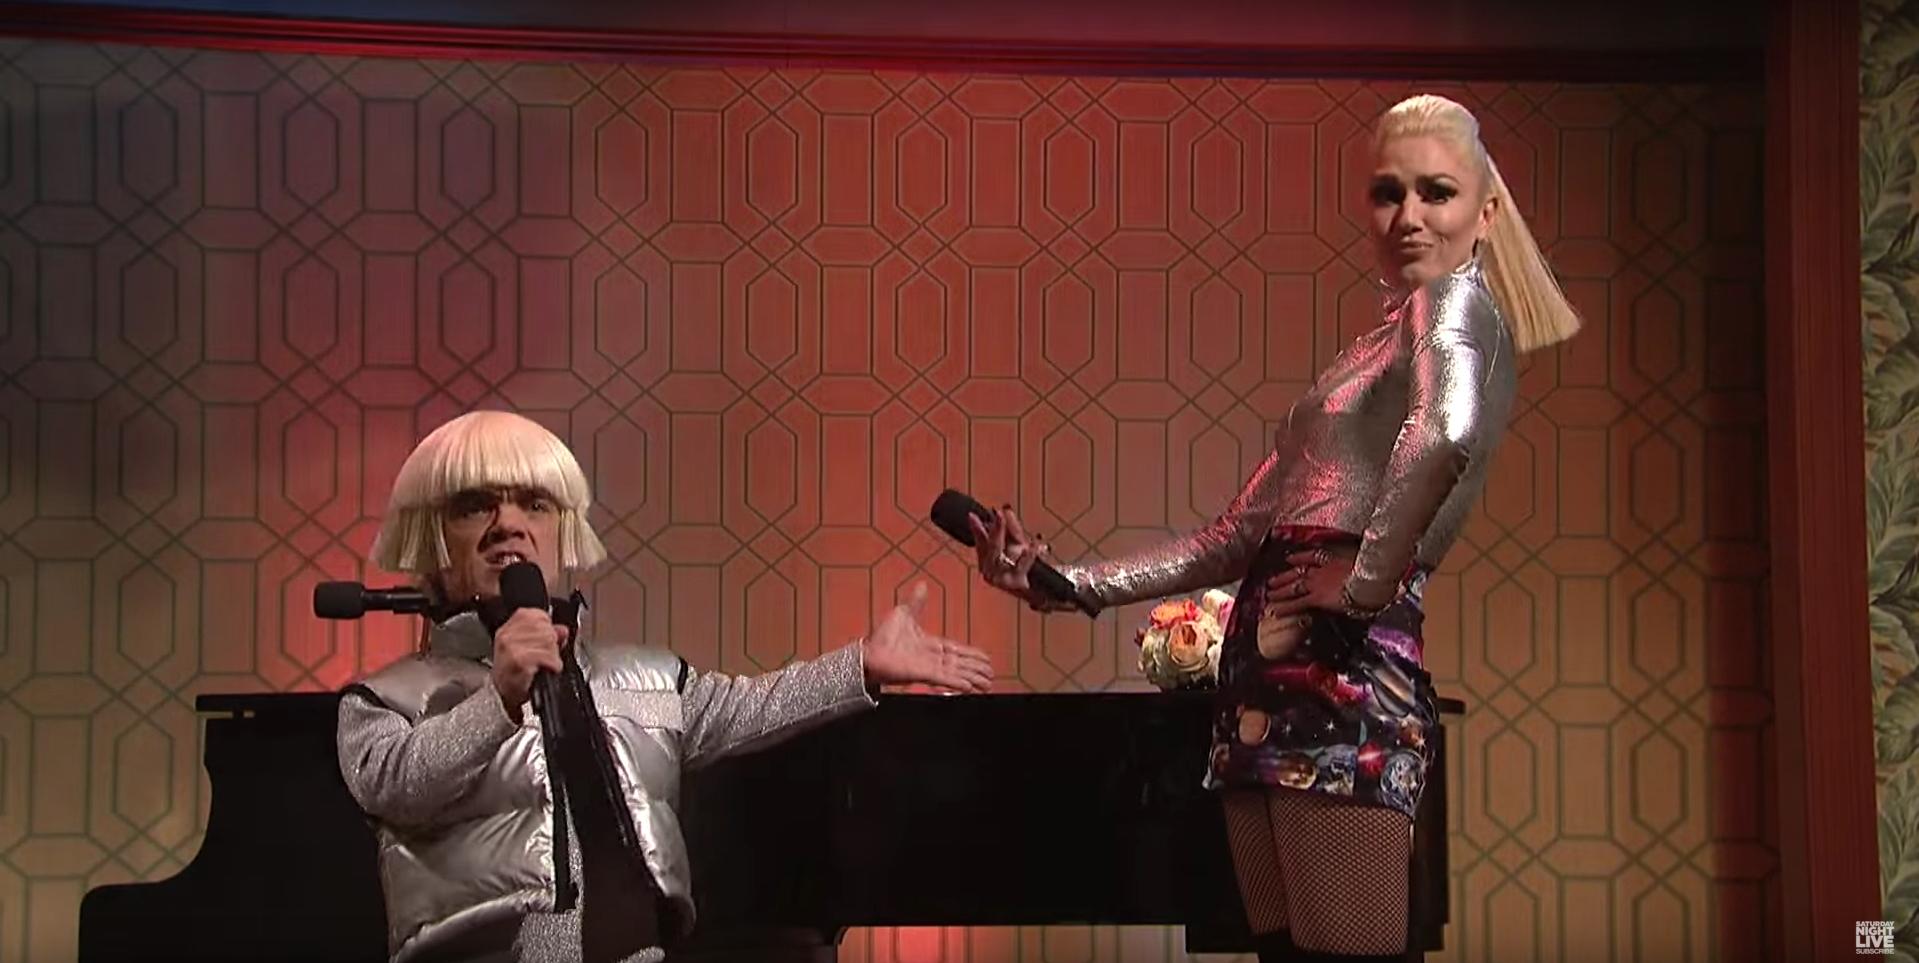 Watch Gwen Stefani Rock Space Shorts, Bring 'Misery' to 'SNL